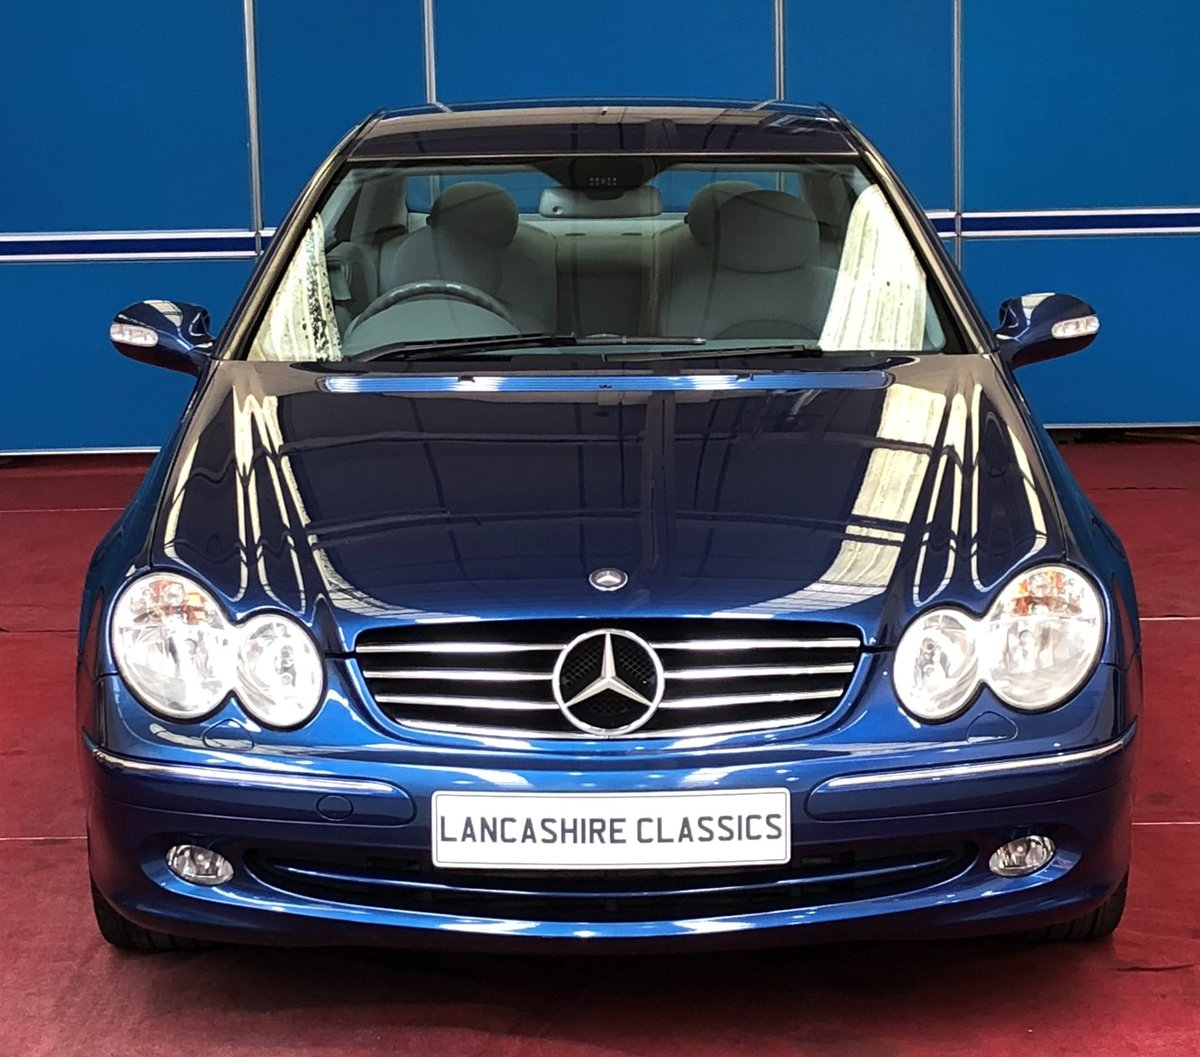 2005 Mercedes CLK200K Avantgarde  For Sale (picture 2 of 6)